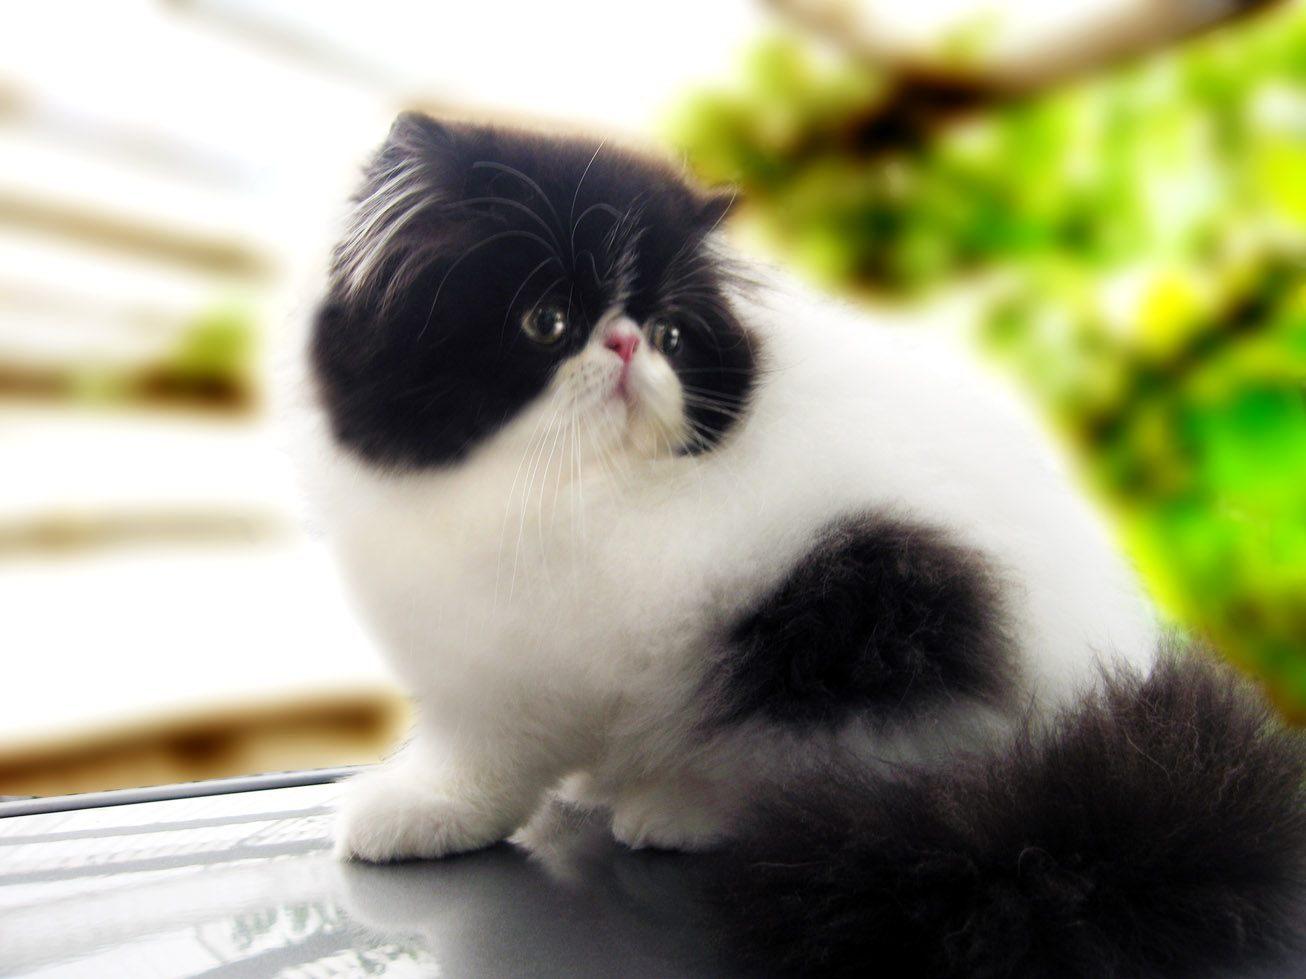 Galera de imgenes Raza de gatos persa